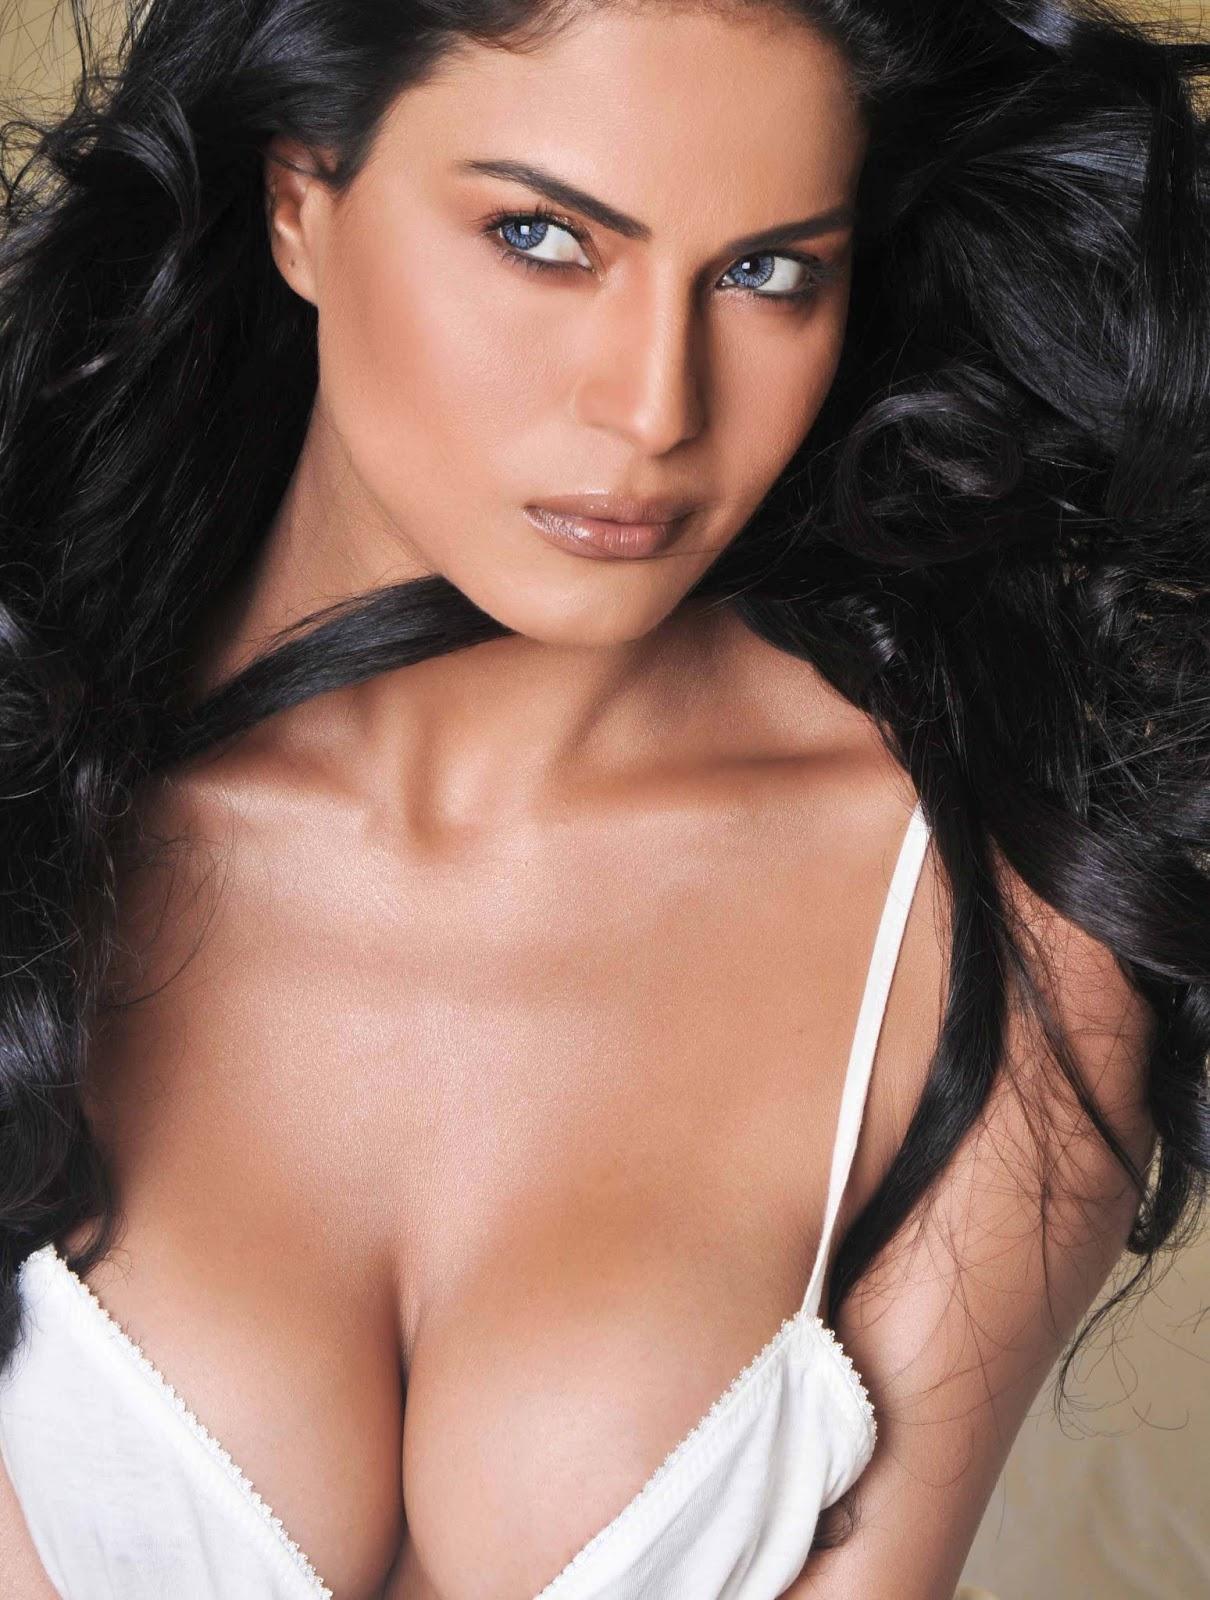 Pakistani Sexy Actress Veena Malik Very Hottest Actress-5321